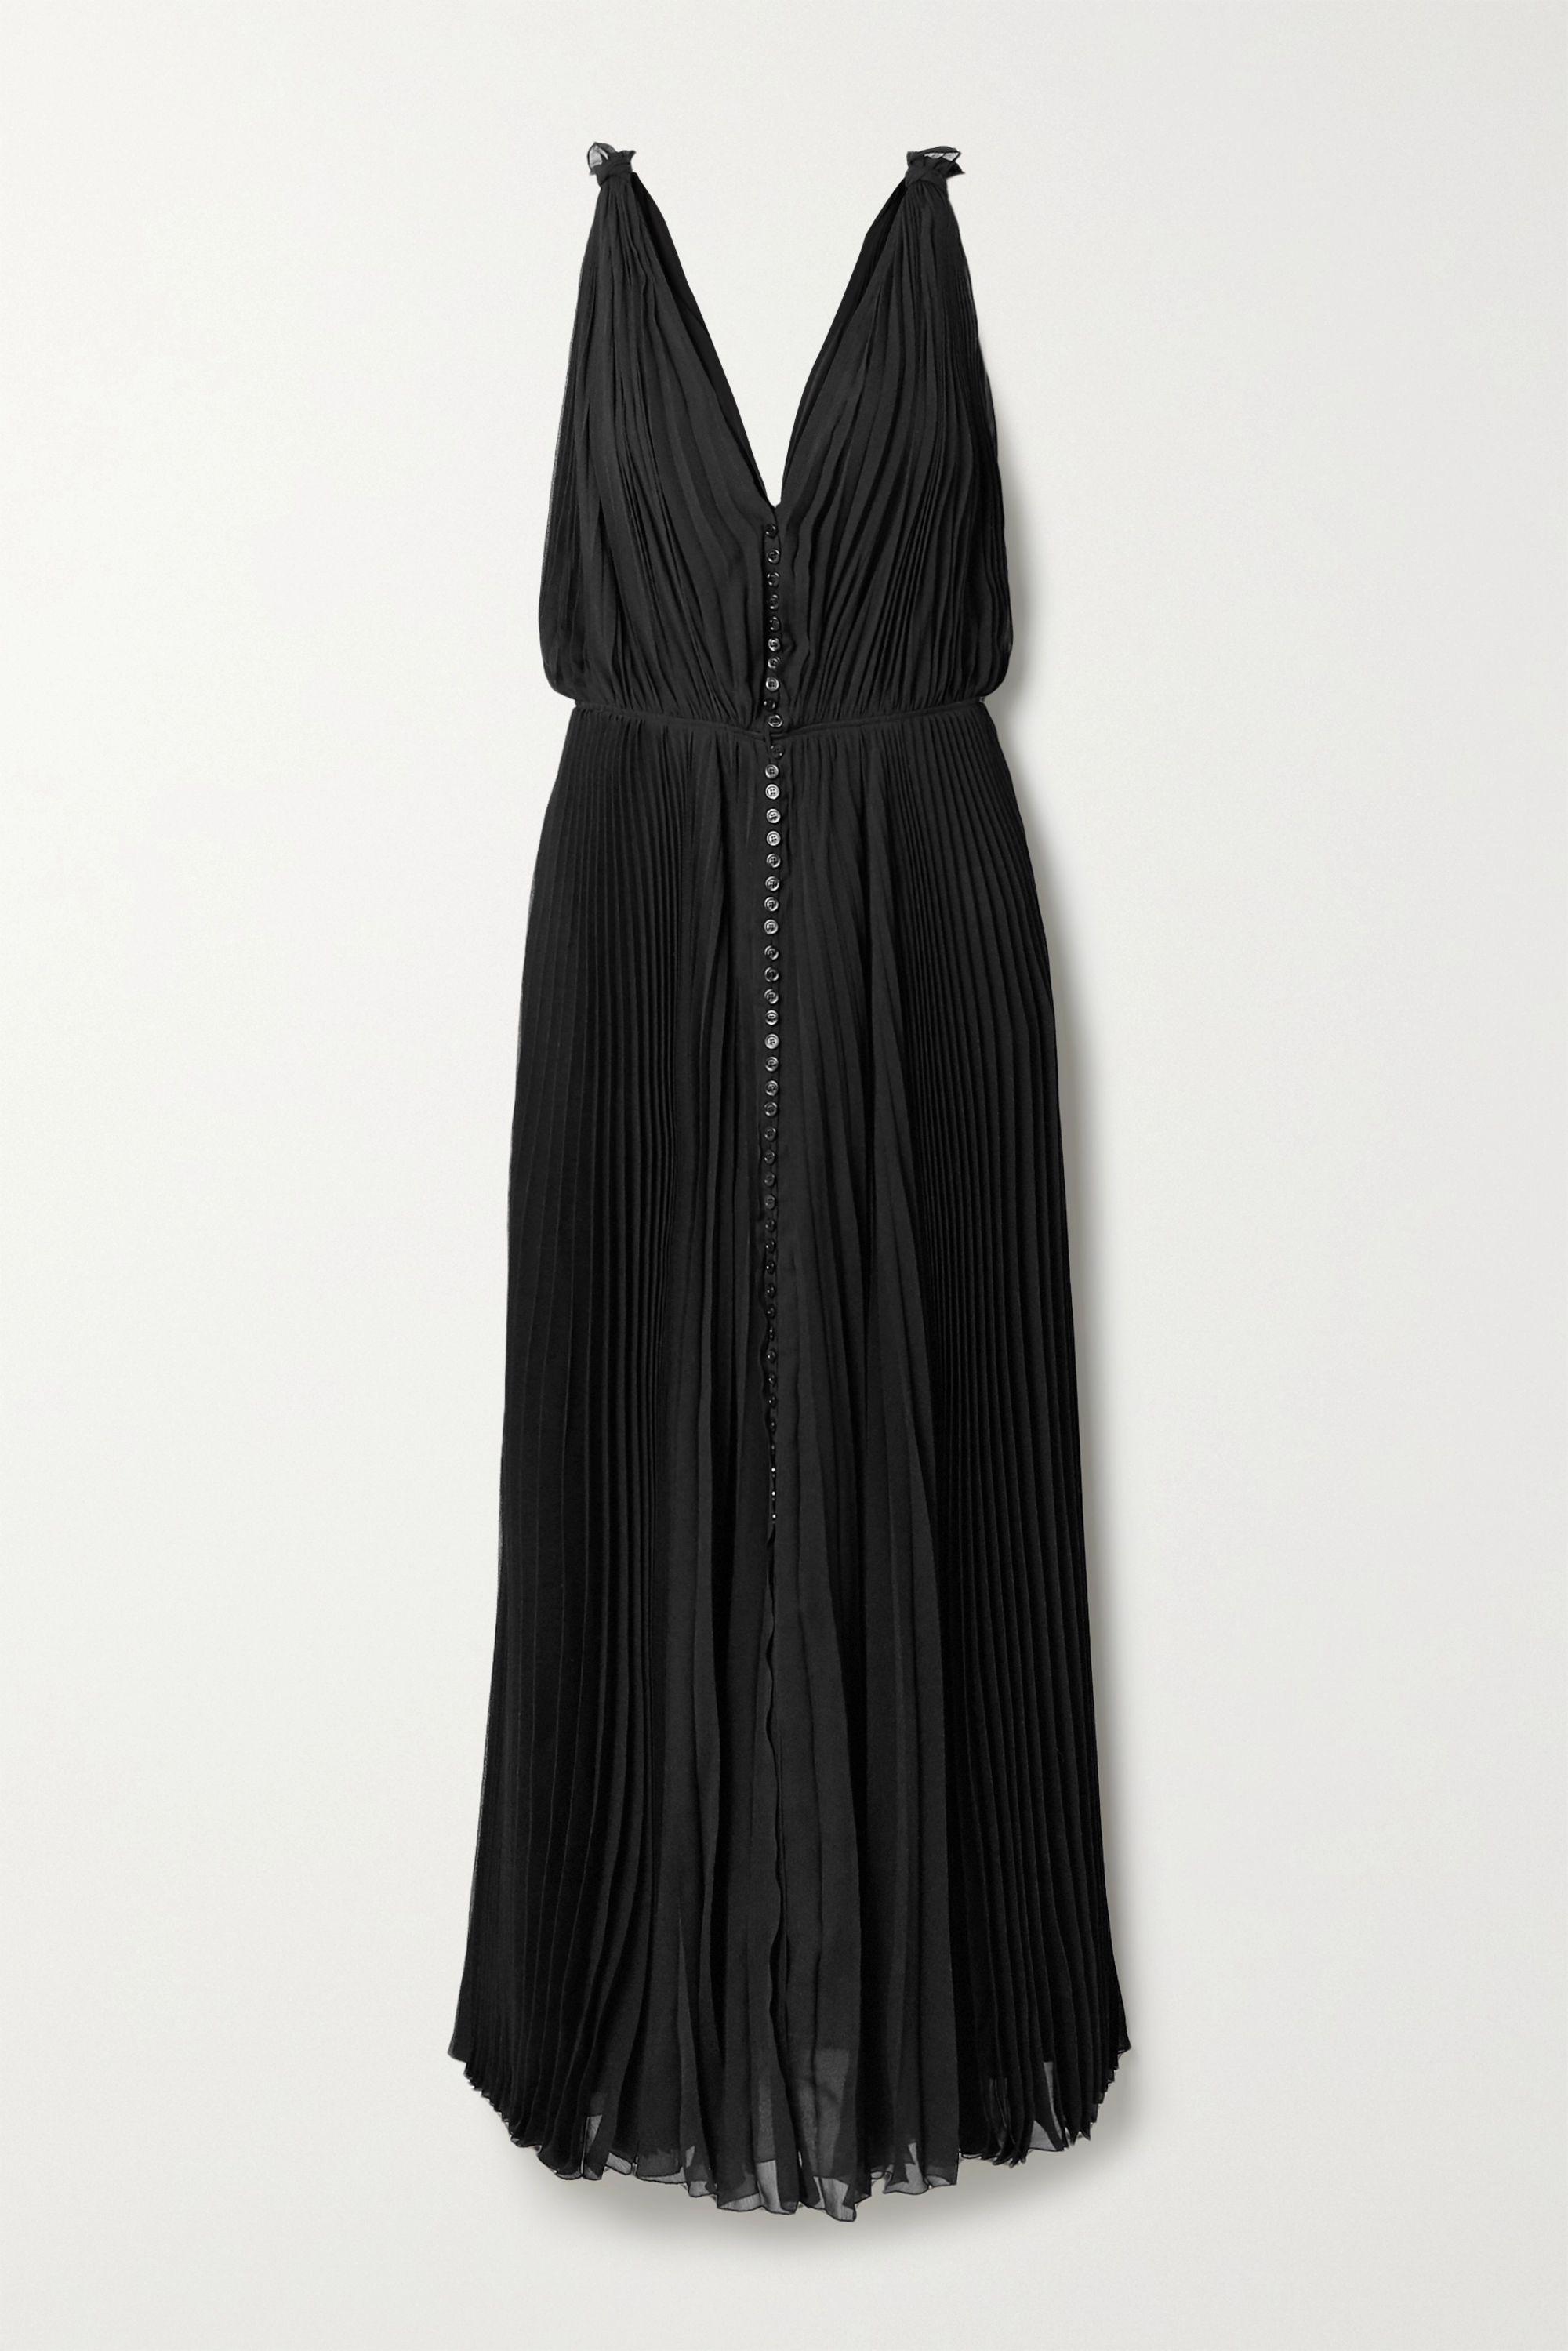 Chloé Plissé-crepon maxi dress